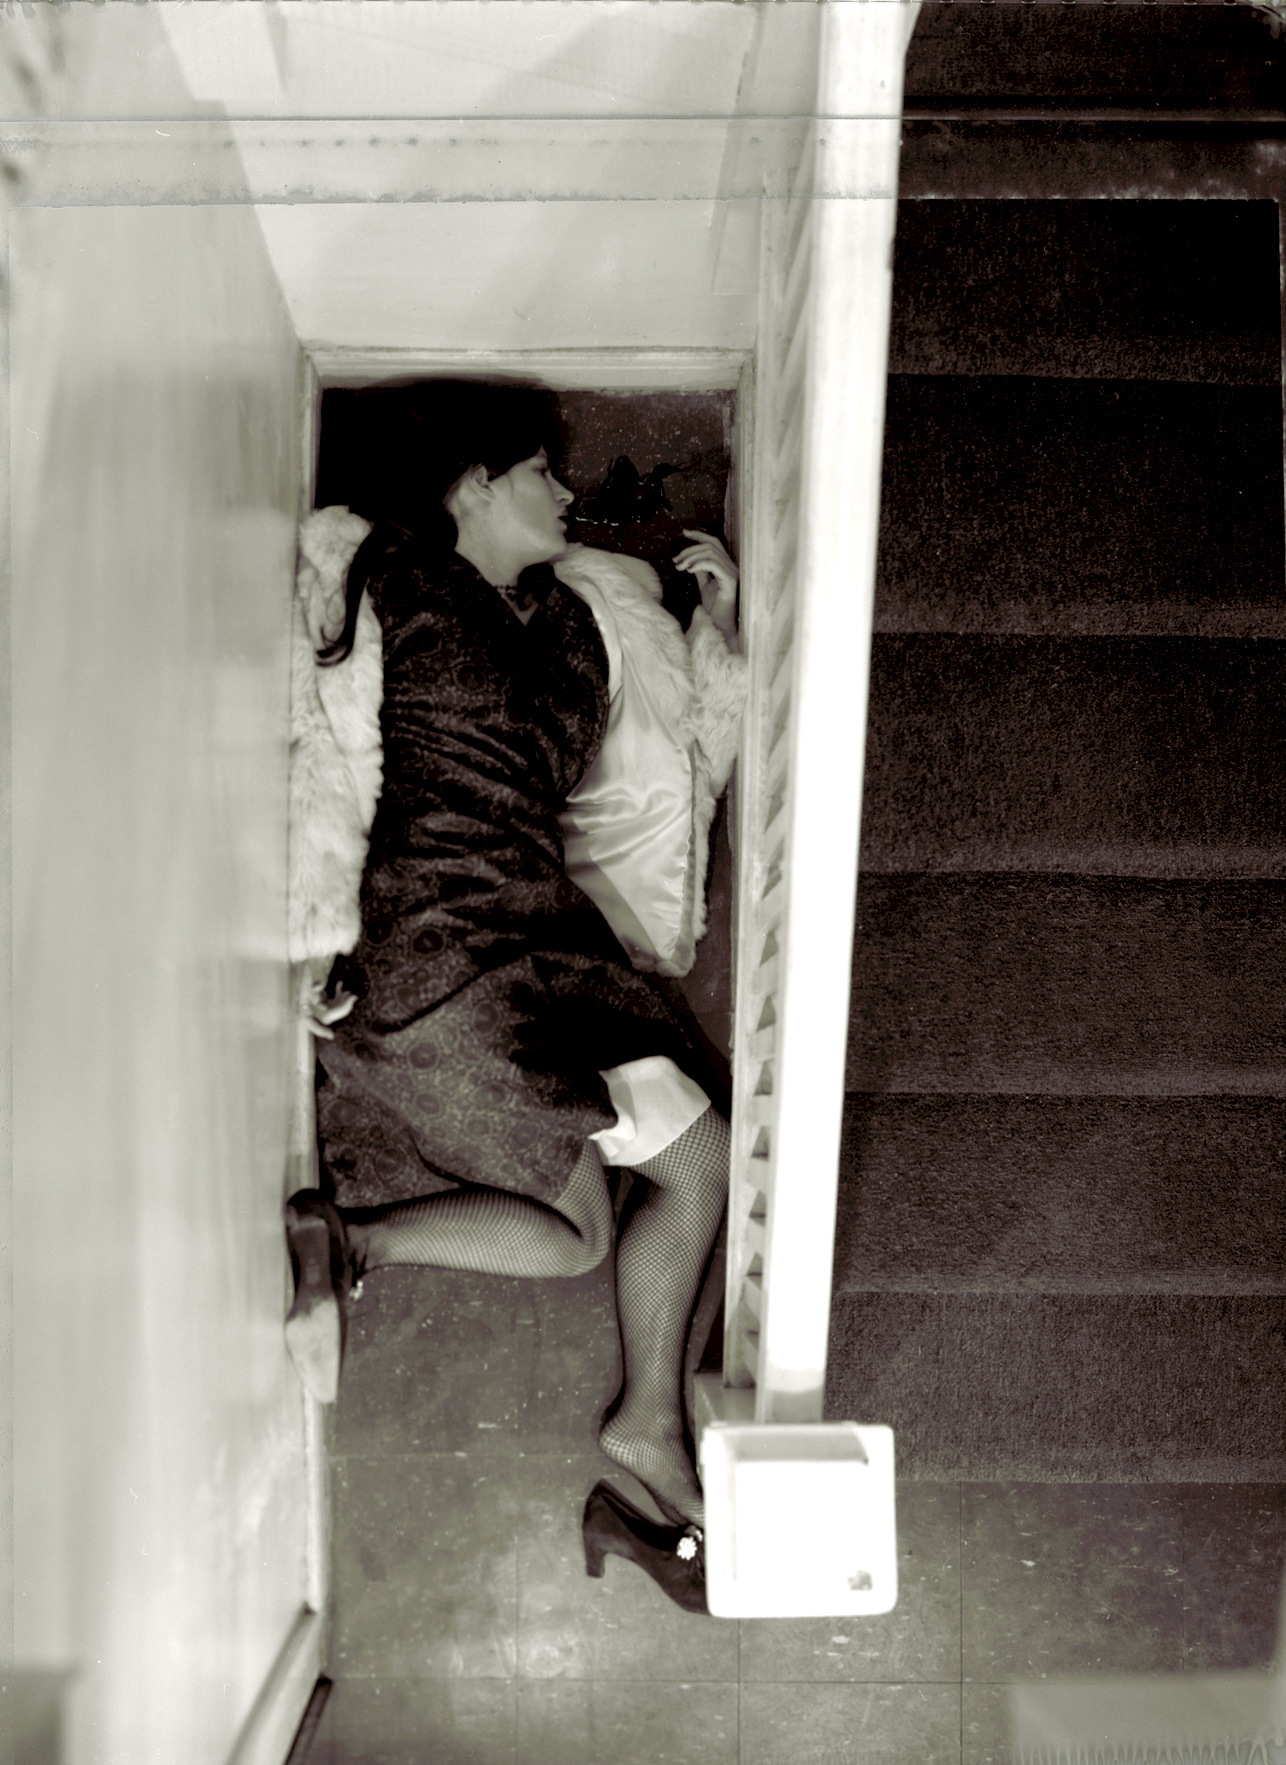 Crime Scene: Koshtra by Virginia Conesa-O'Gara